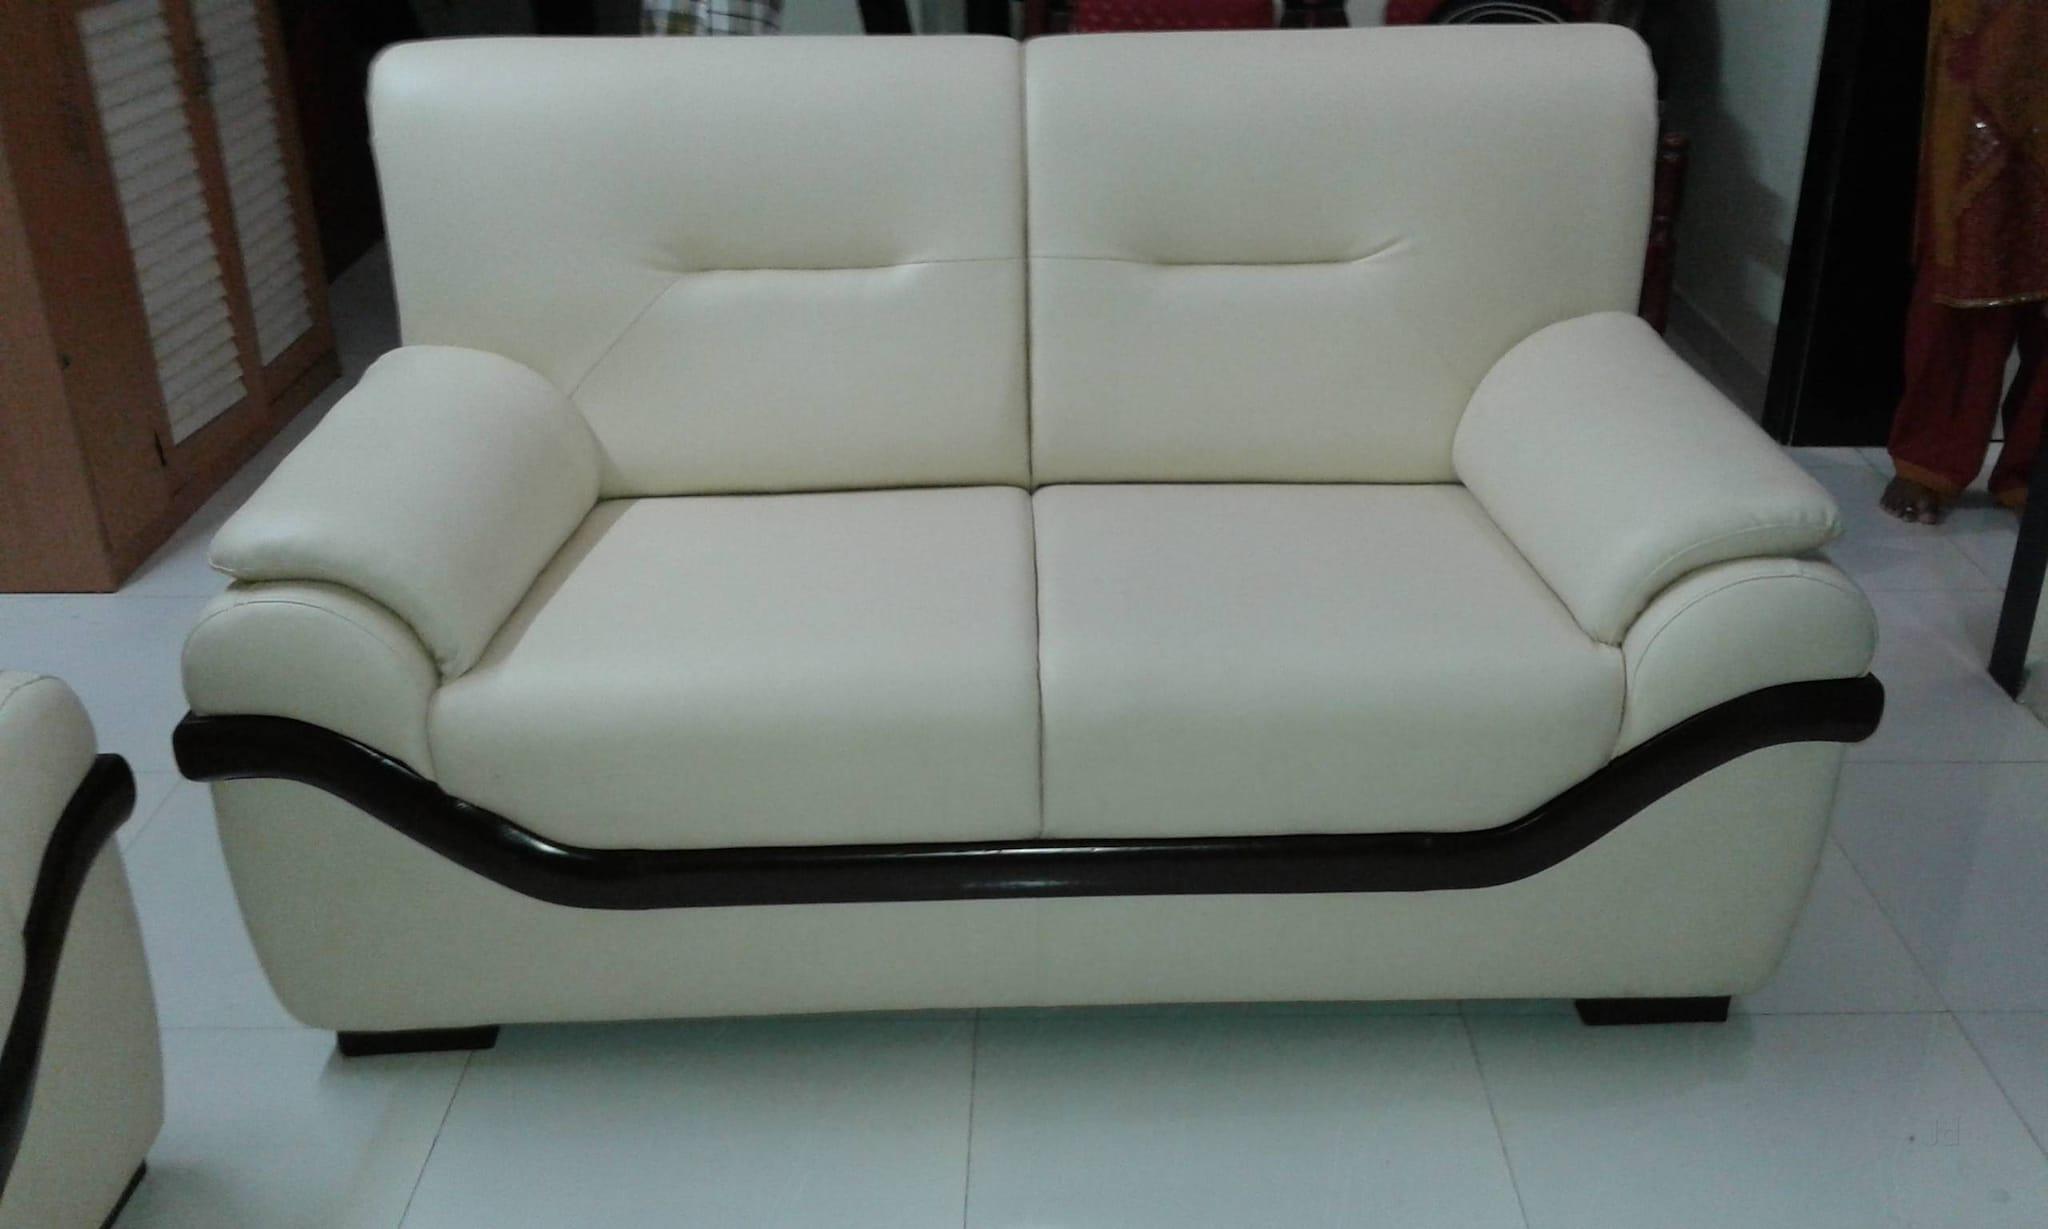 Sofa Repair Services In Pune